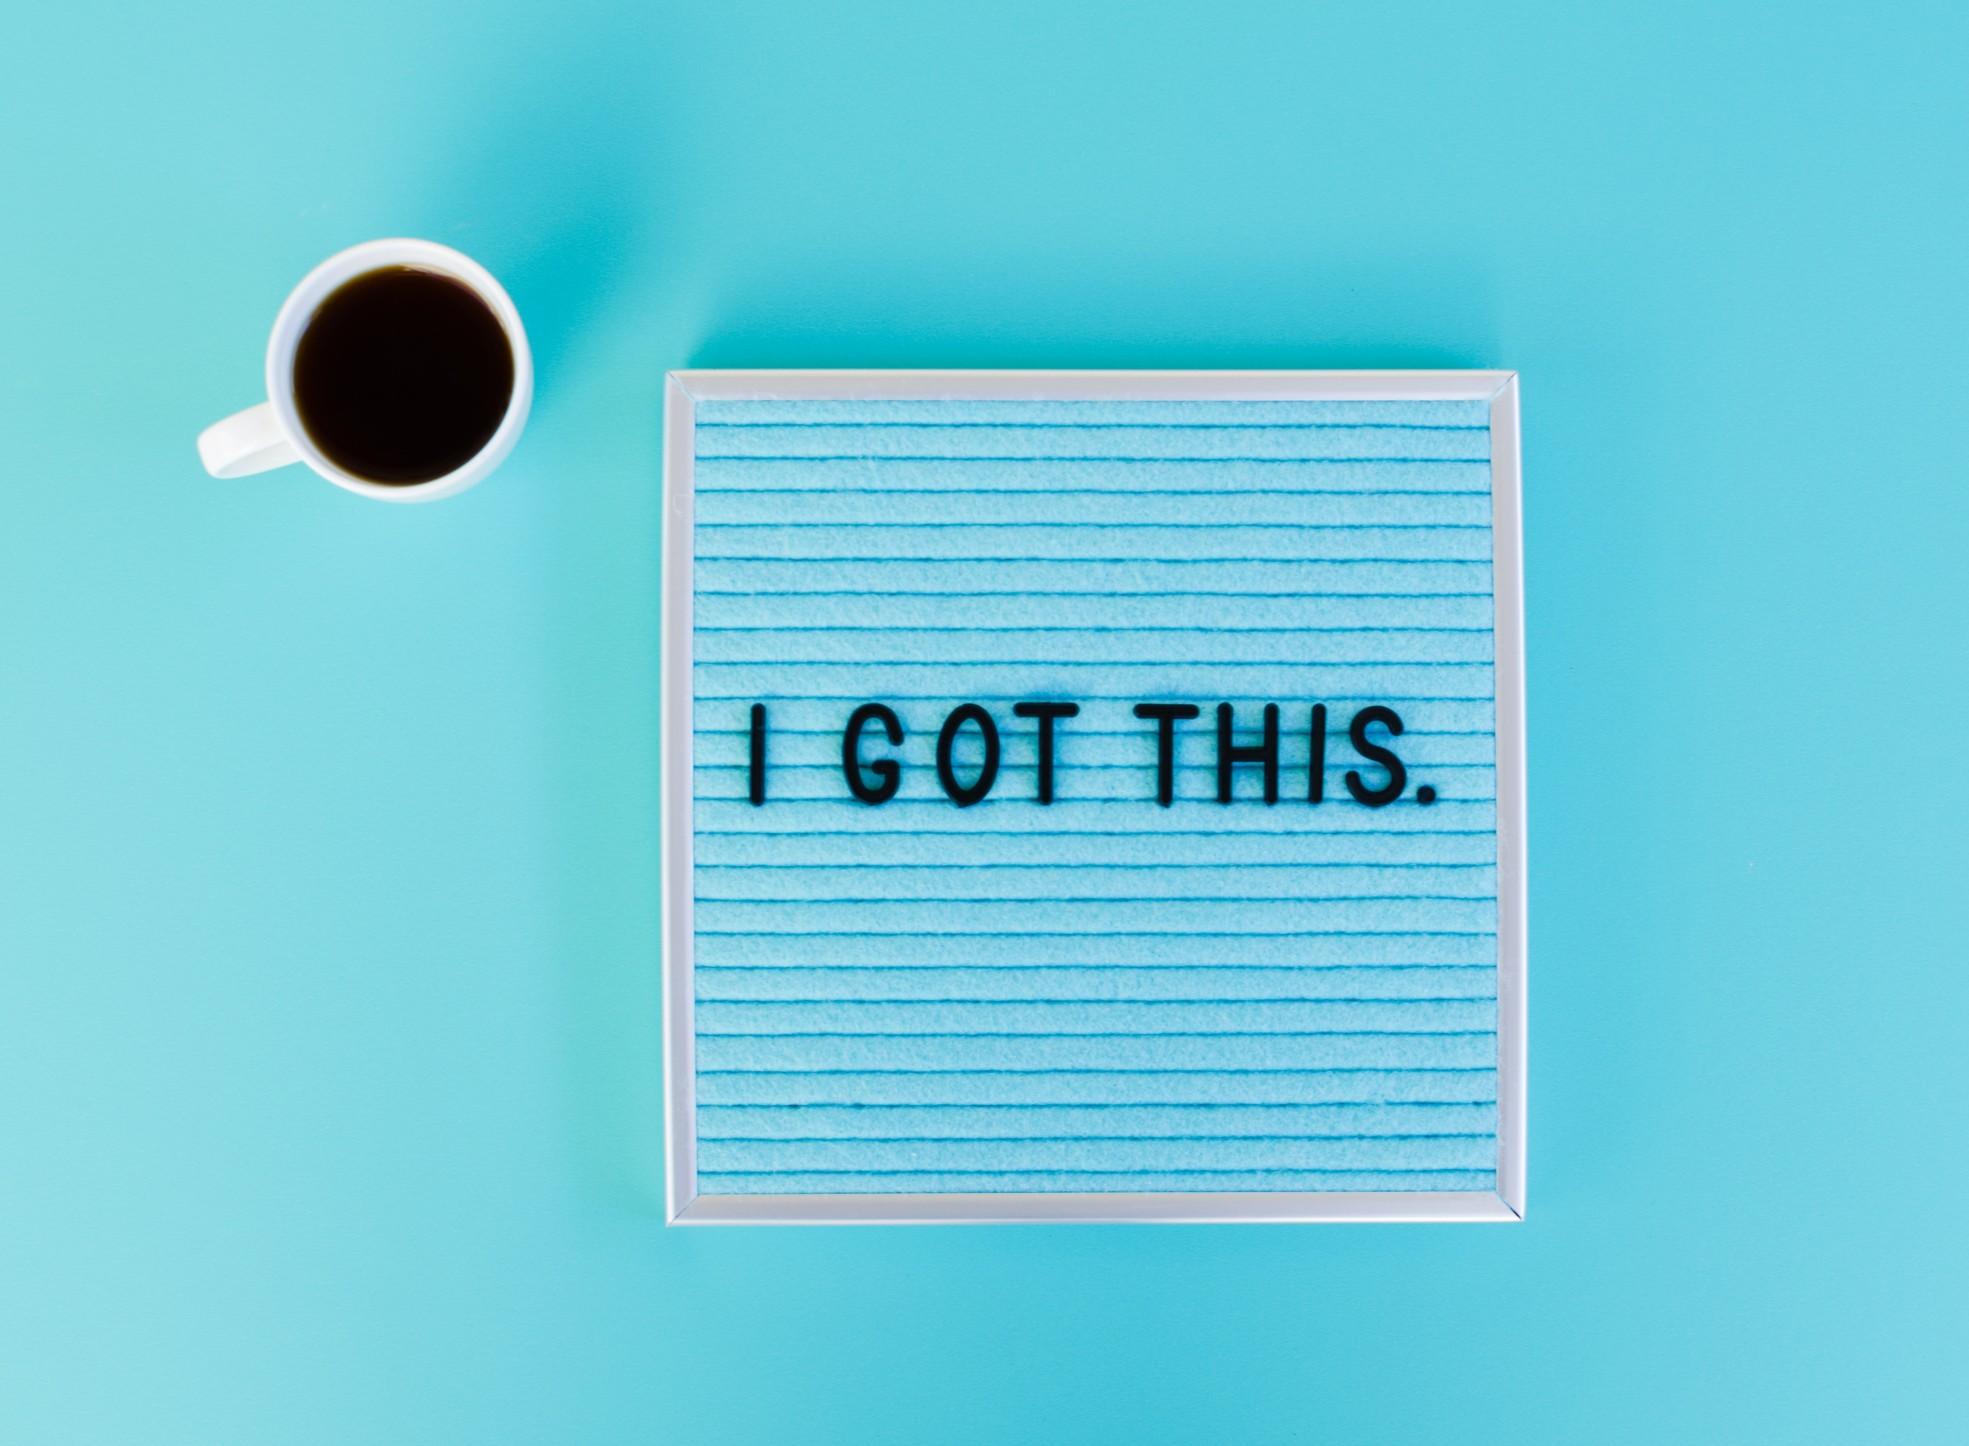 motivational-words-on-board-next-to-coffee-mug